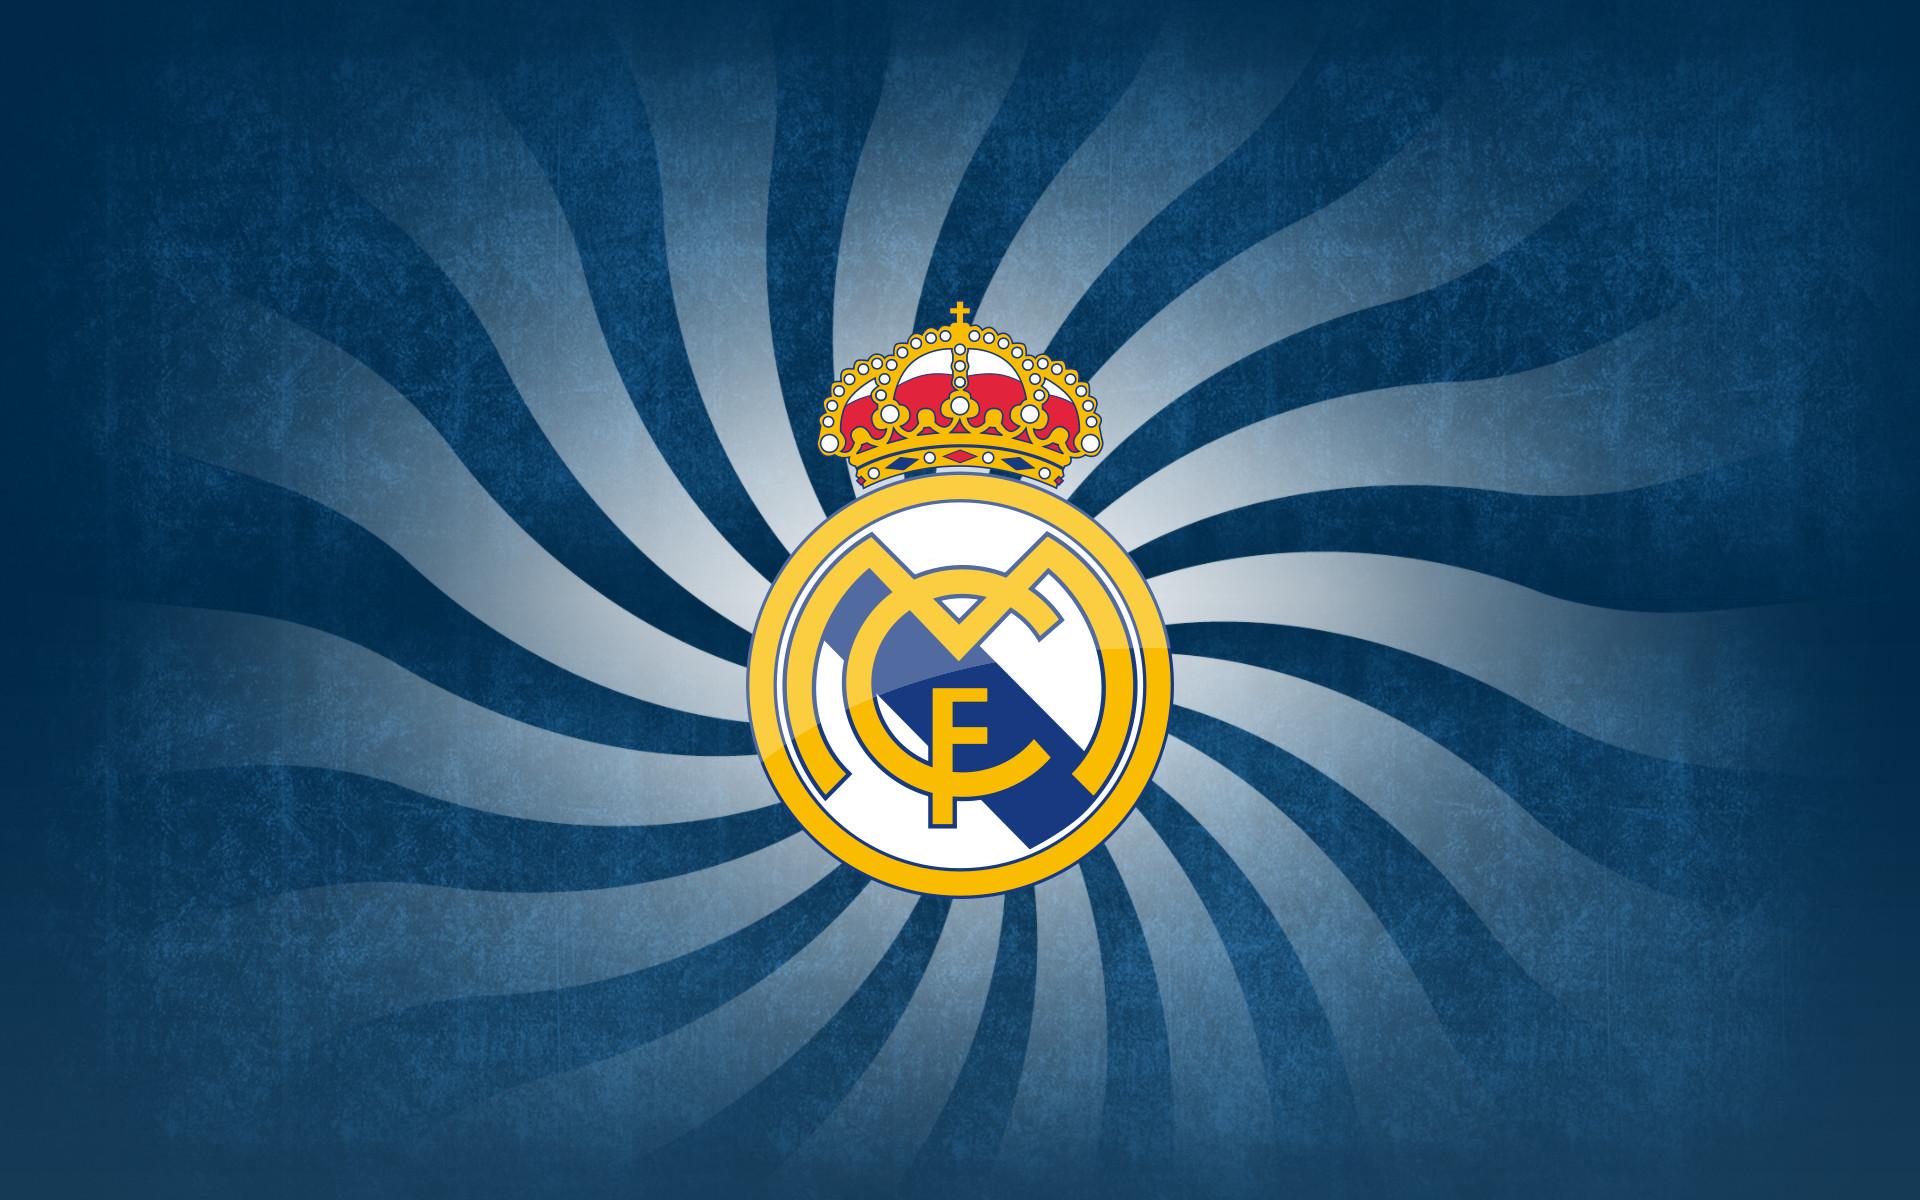 1920x1080 Real Madrid HD Wallpapers Wallpaper 800×500 RealMadrid Wallpaper (48 Wallpapers) | Adorable